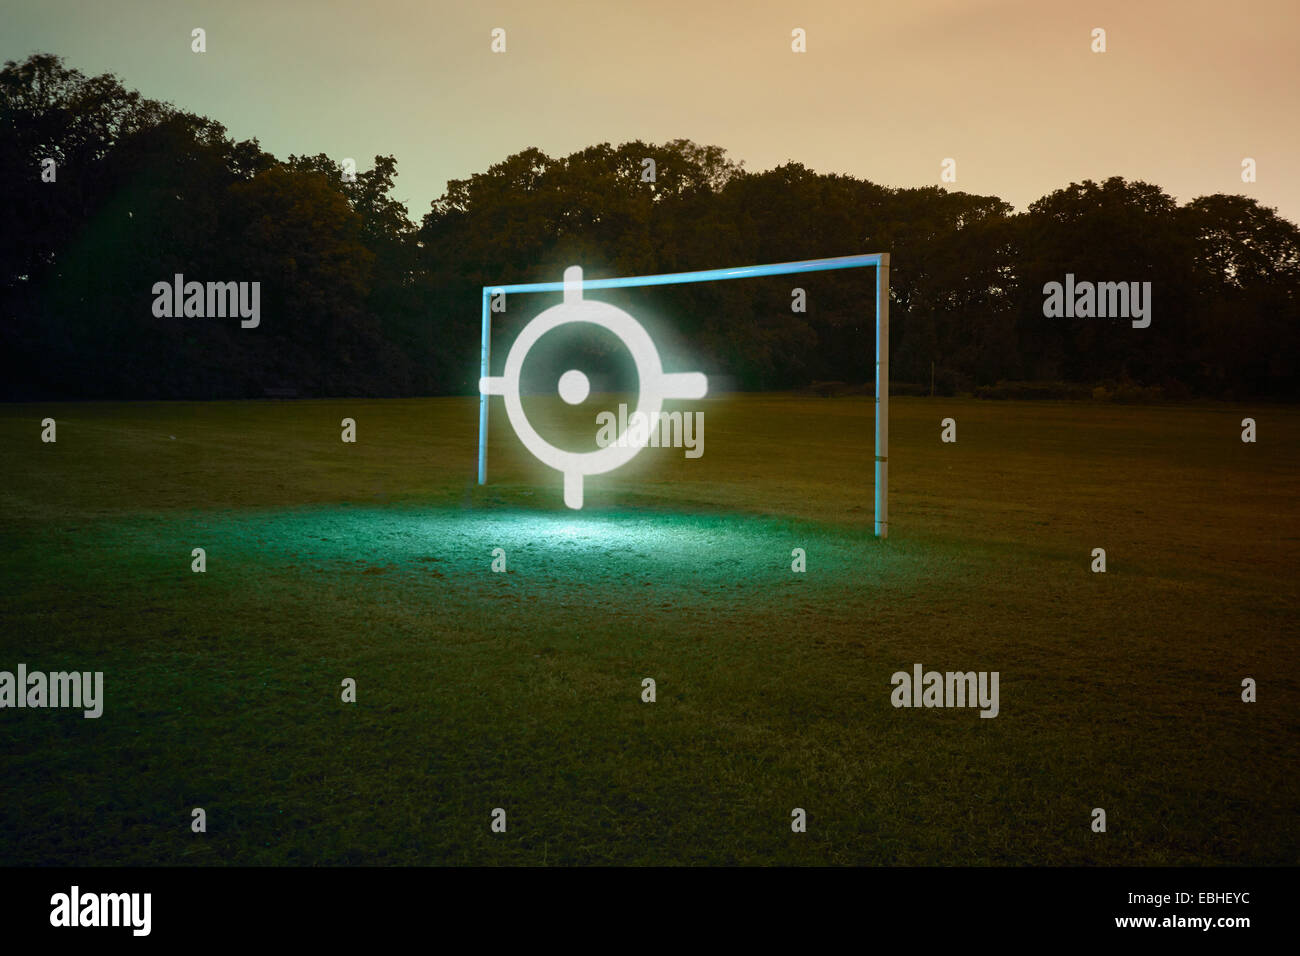 Football goal with illuminated target symbol - Stock Image